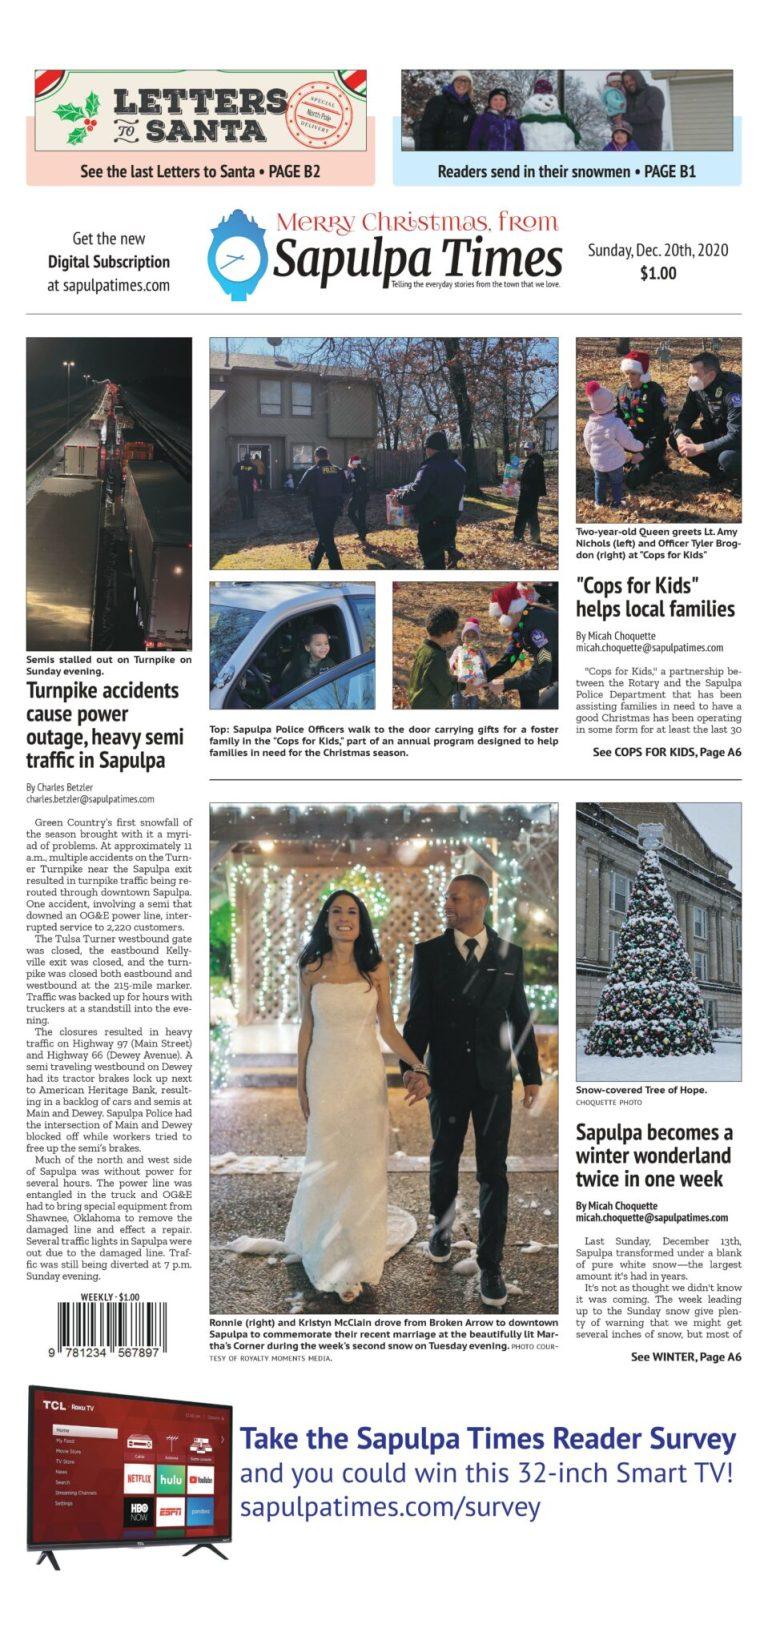 Sapulpa Times Digital Edition 12/20/2020